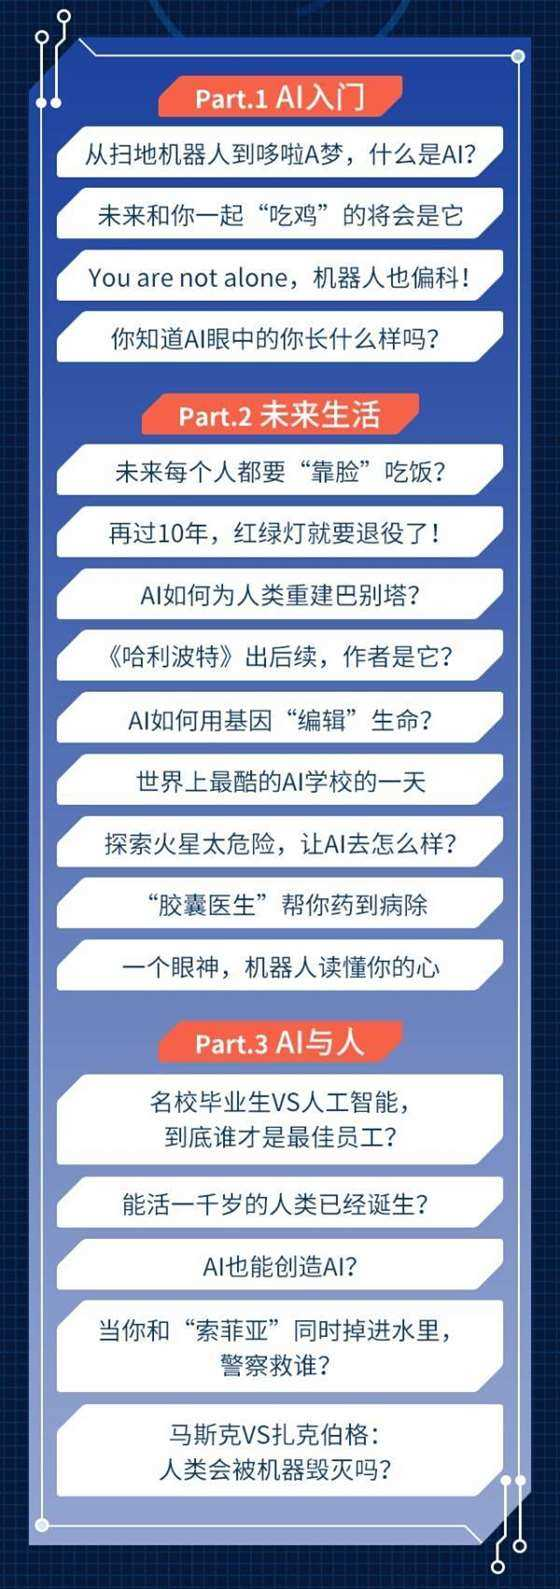 http://www.huodongxing.com/file/20160530/5092341960349/693163070810931.jpg